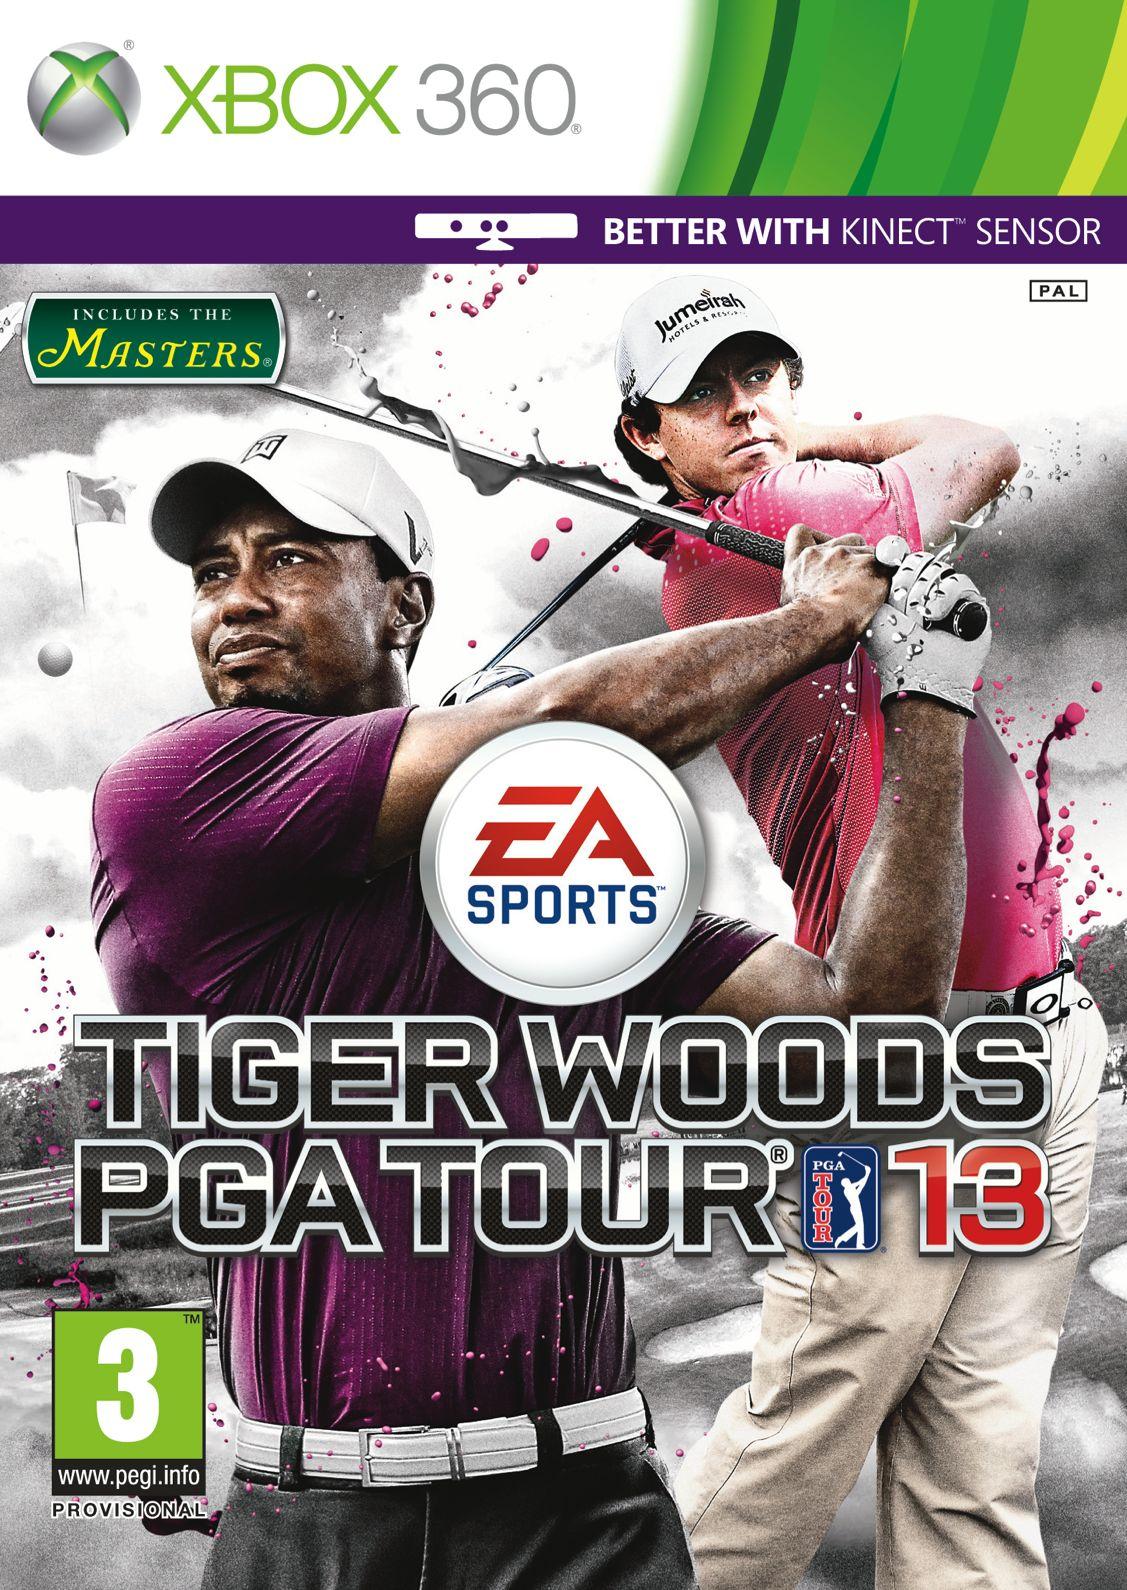 Tiger Woods Pga Tour  Cheat Codes Xbox